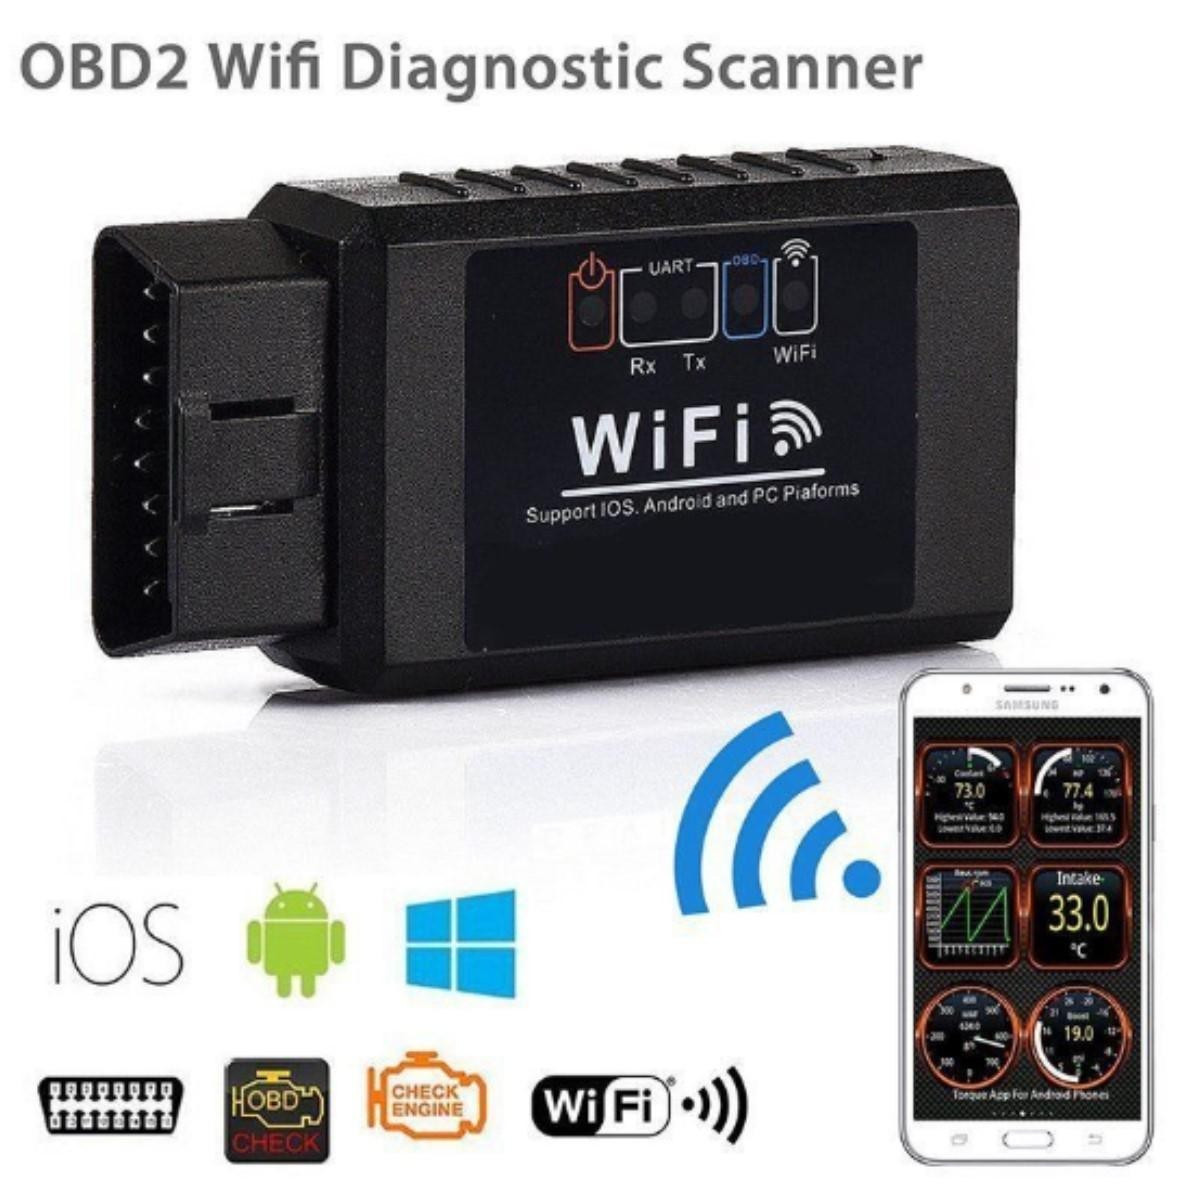 Диагностический автосканер адаптер OBD2 сканер ELM327 WiFi v1.5 для Android/IOS iphone OBD